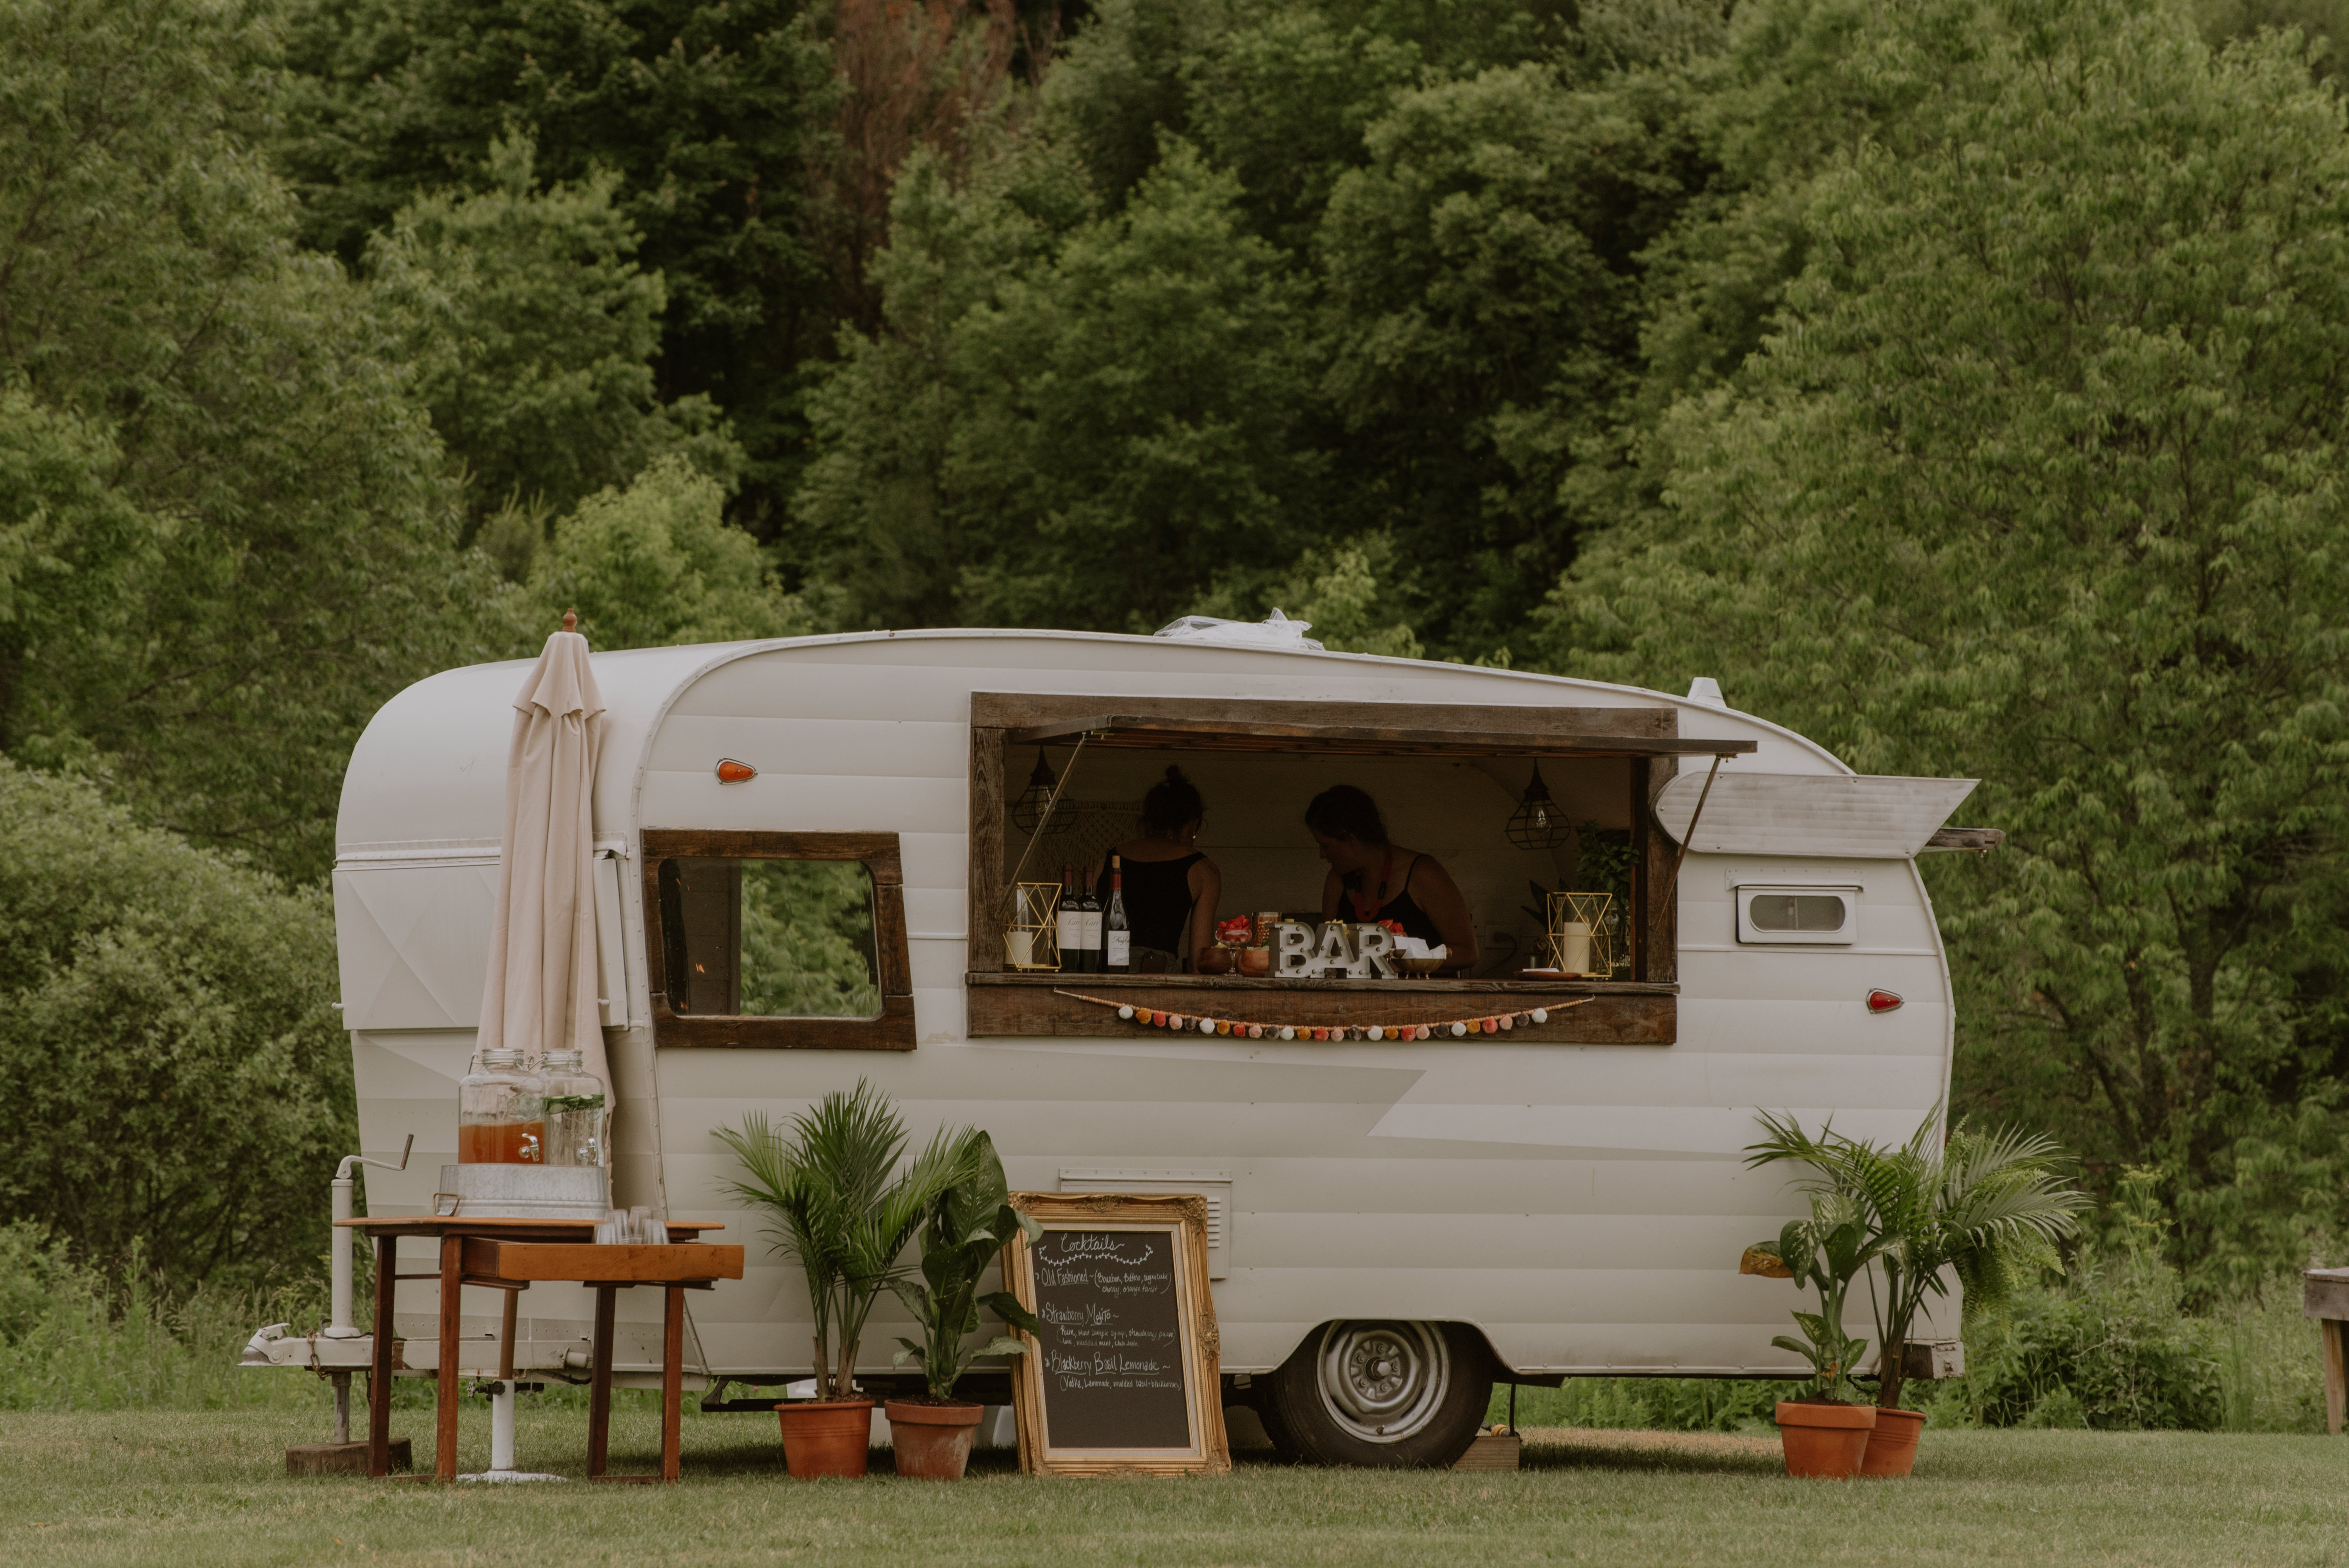 Amber-Alex-Wedding-Upstate-Catskills-Summer-Meadowlark-Stills-Lawrence-Braun--0213